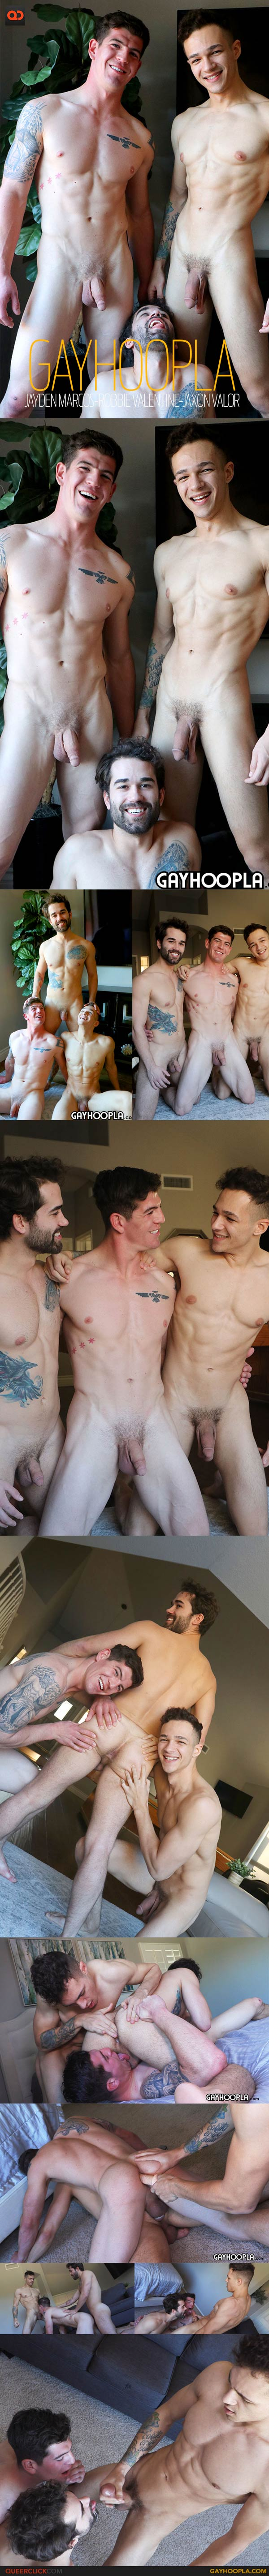 GayHoopla: Jayden Marcos, Robbie Valentine, and Jaxon Valor